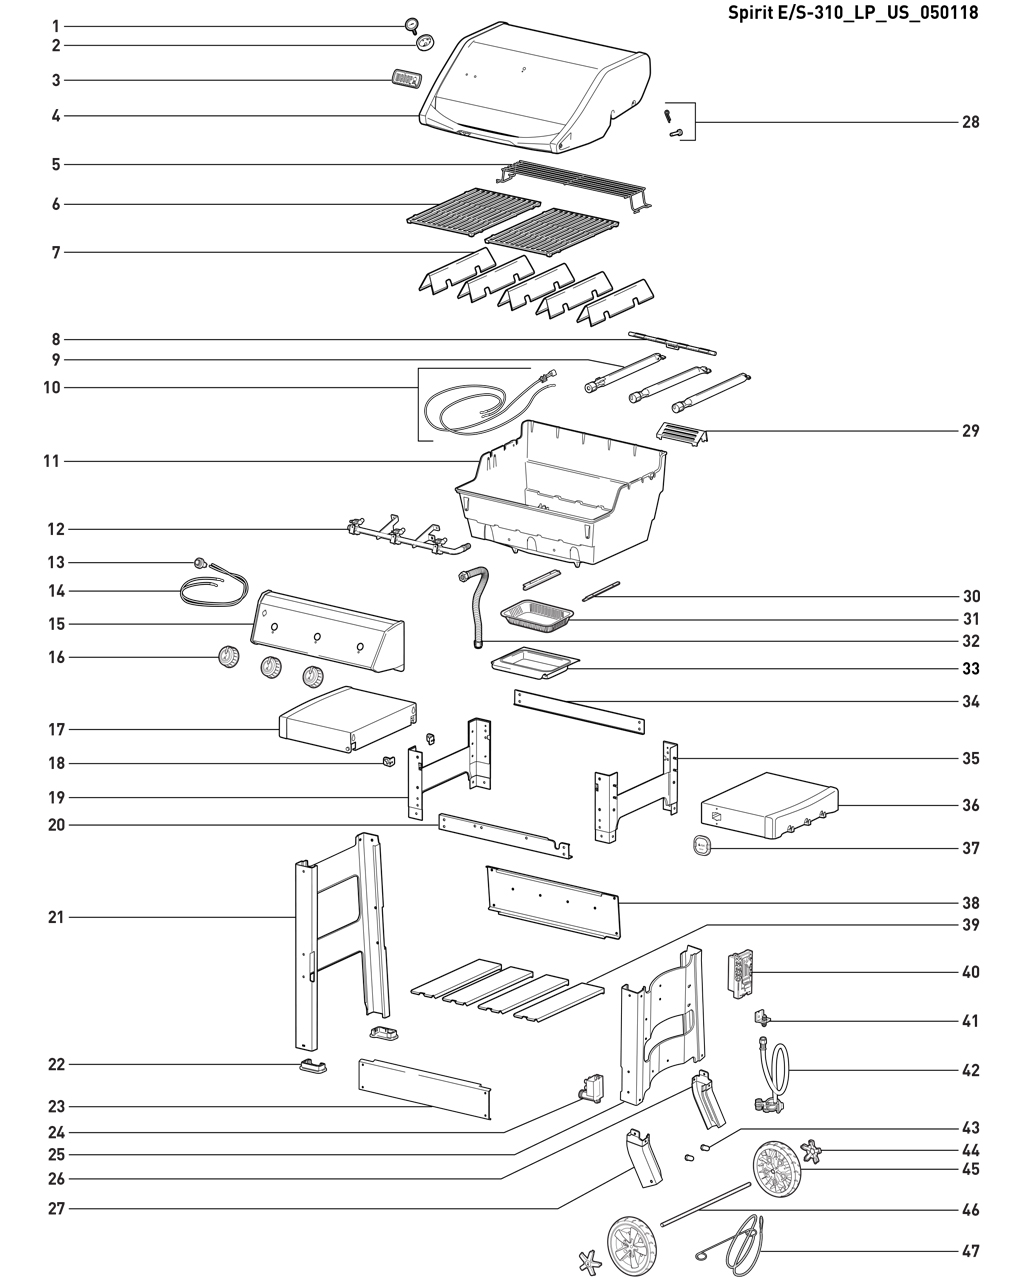 Schematic Image 45010001